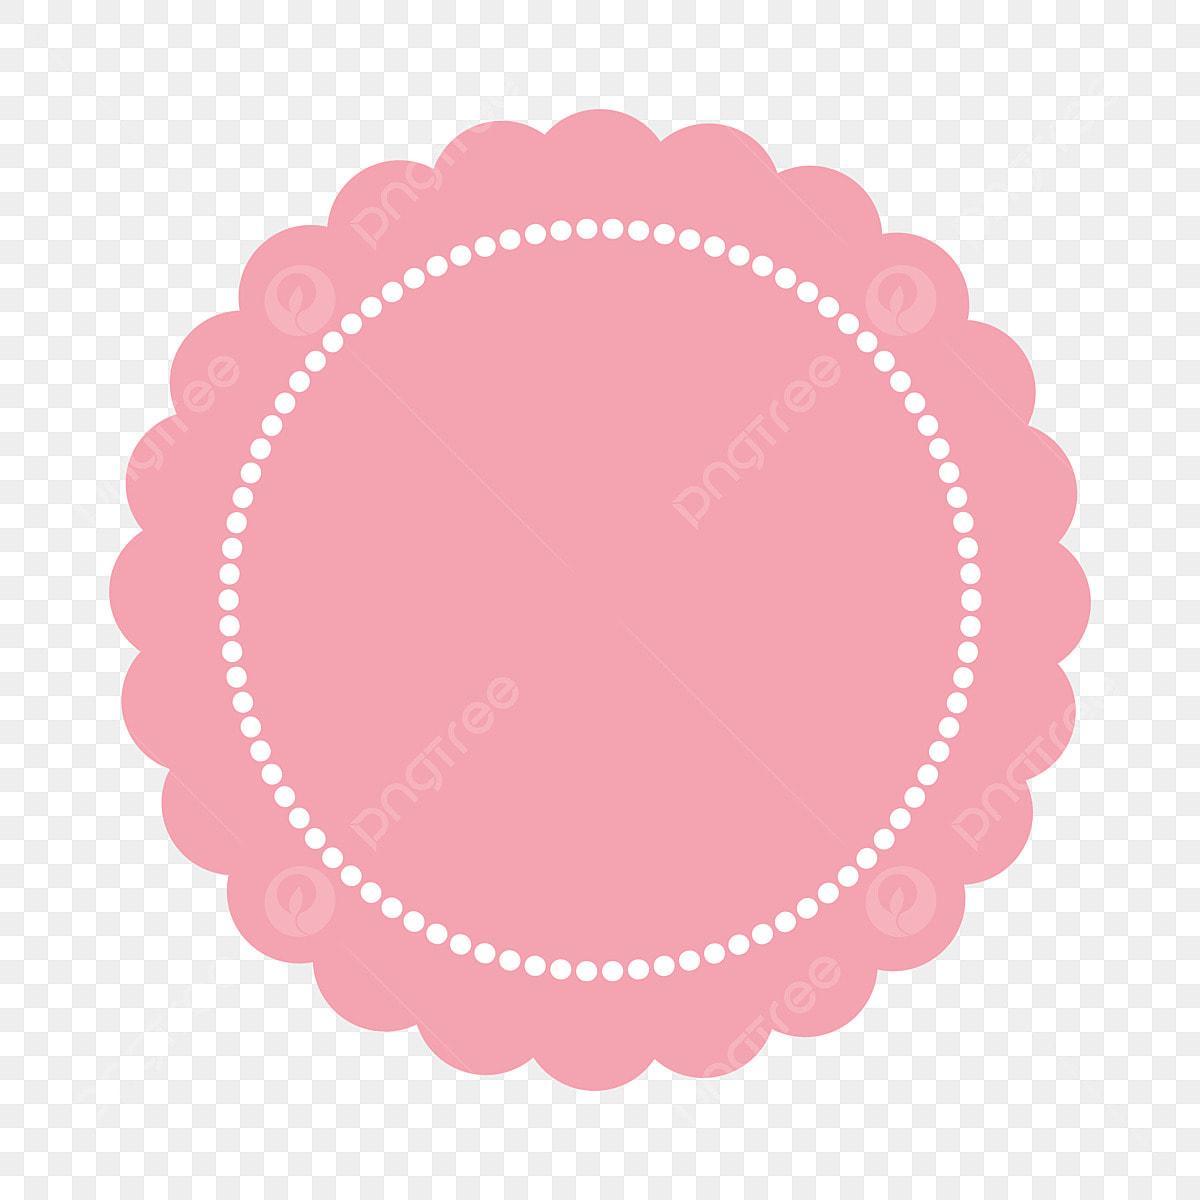 إطار جميل الوردي Clipart بابوا نيو غينيا عنصر إطار دائري إطار